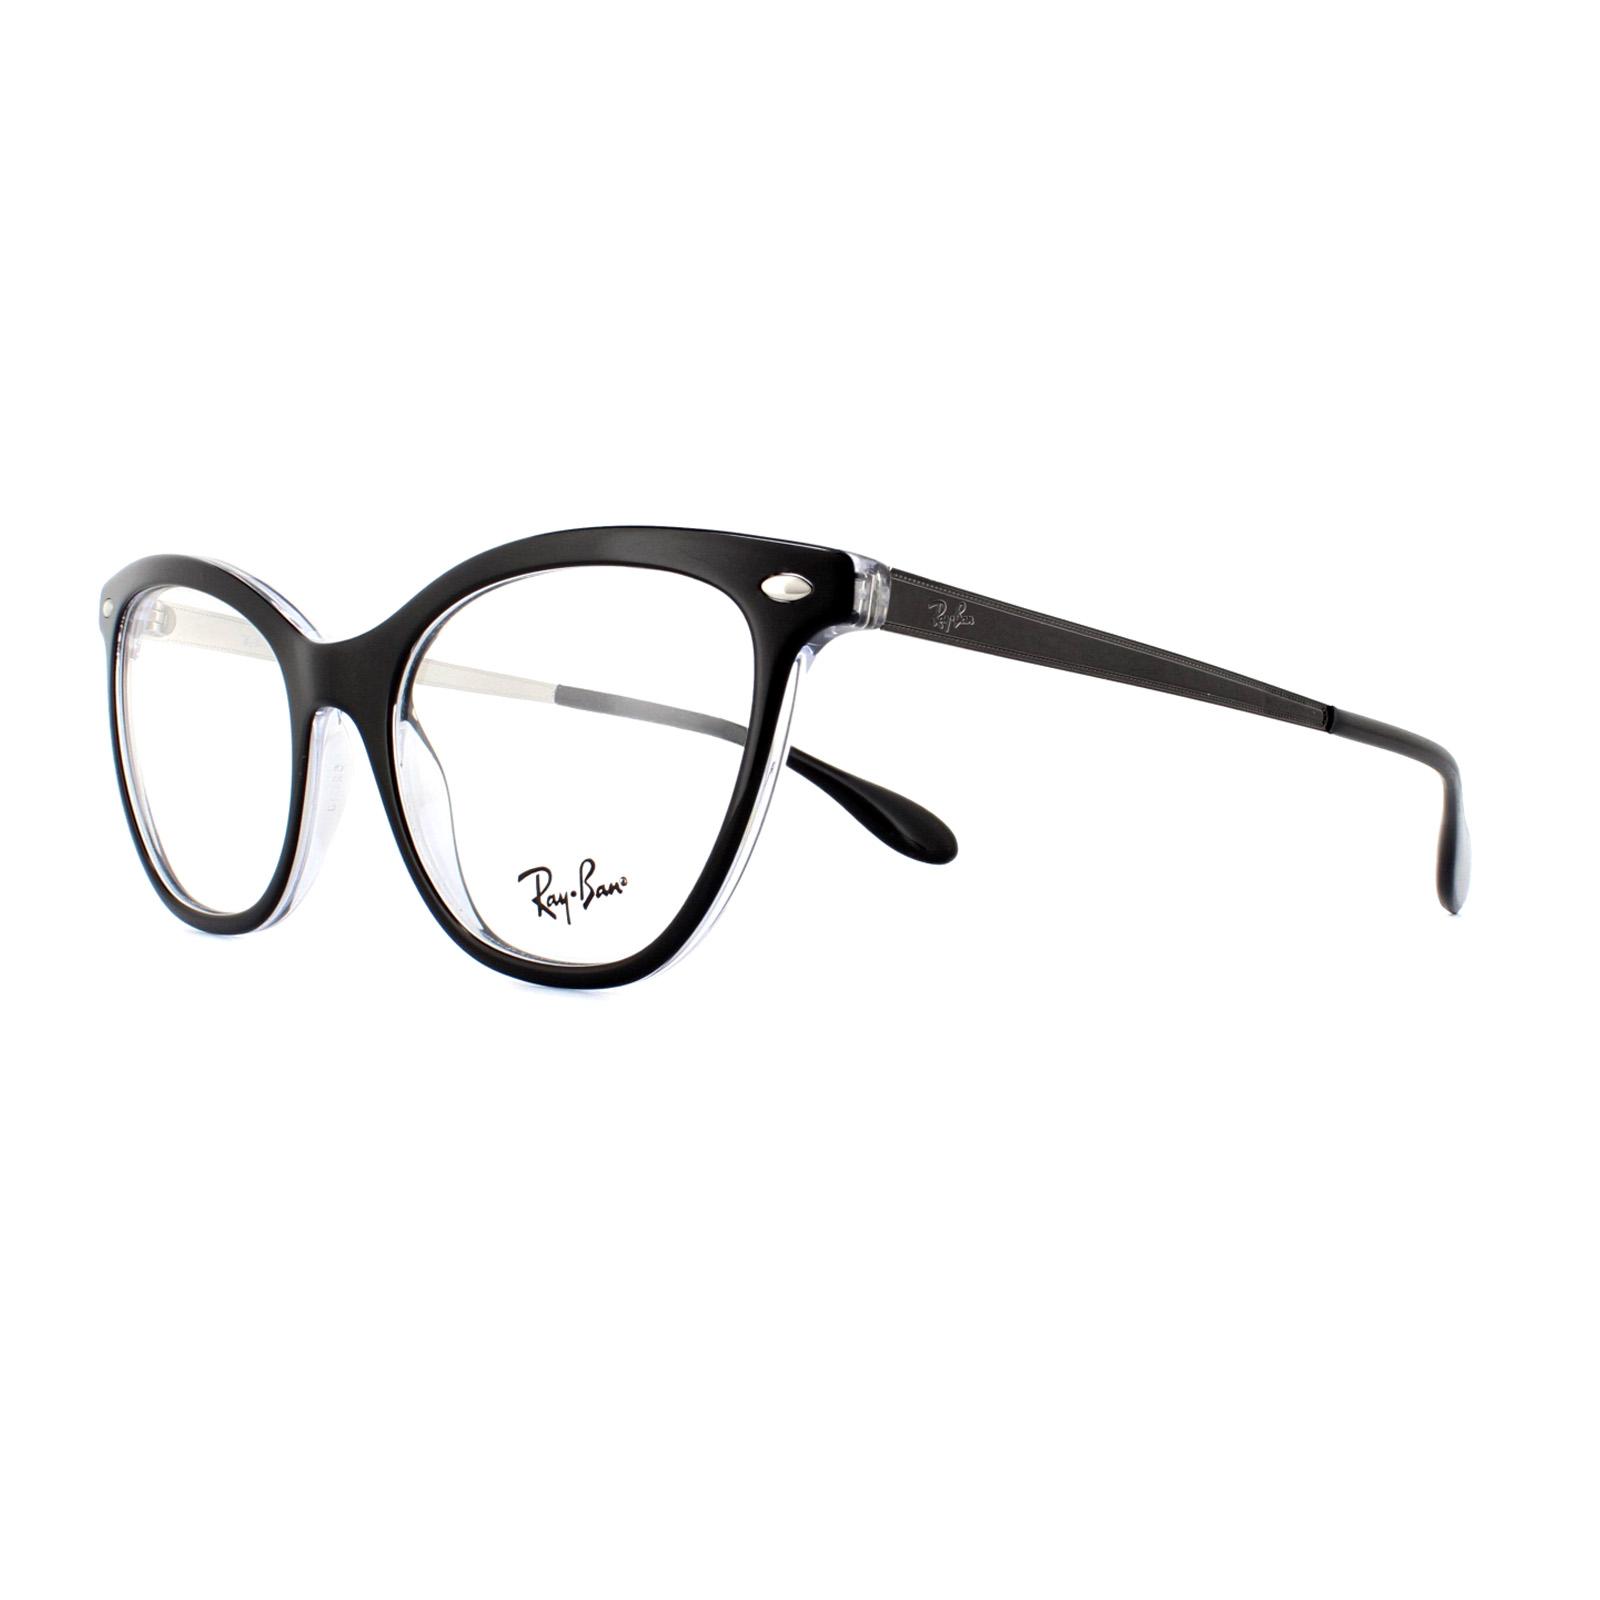 Cheap Ray-Ban 5360 Glasses Frames - Discounted Sunglasses 5658e340d562